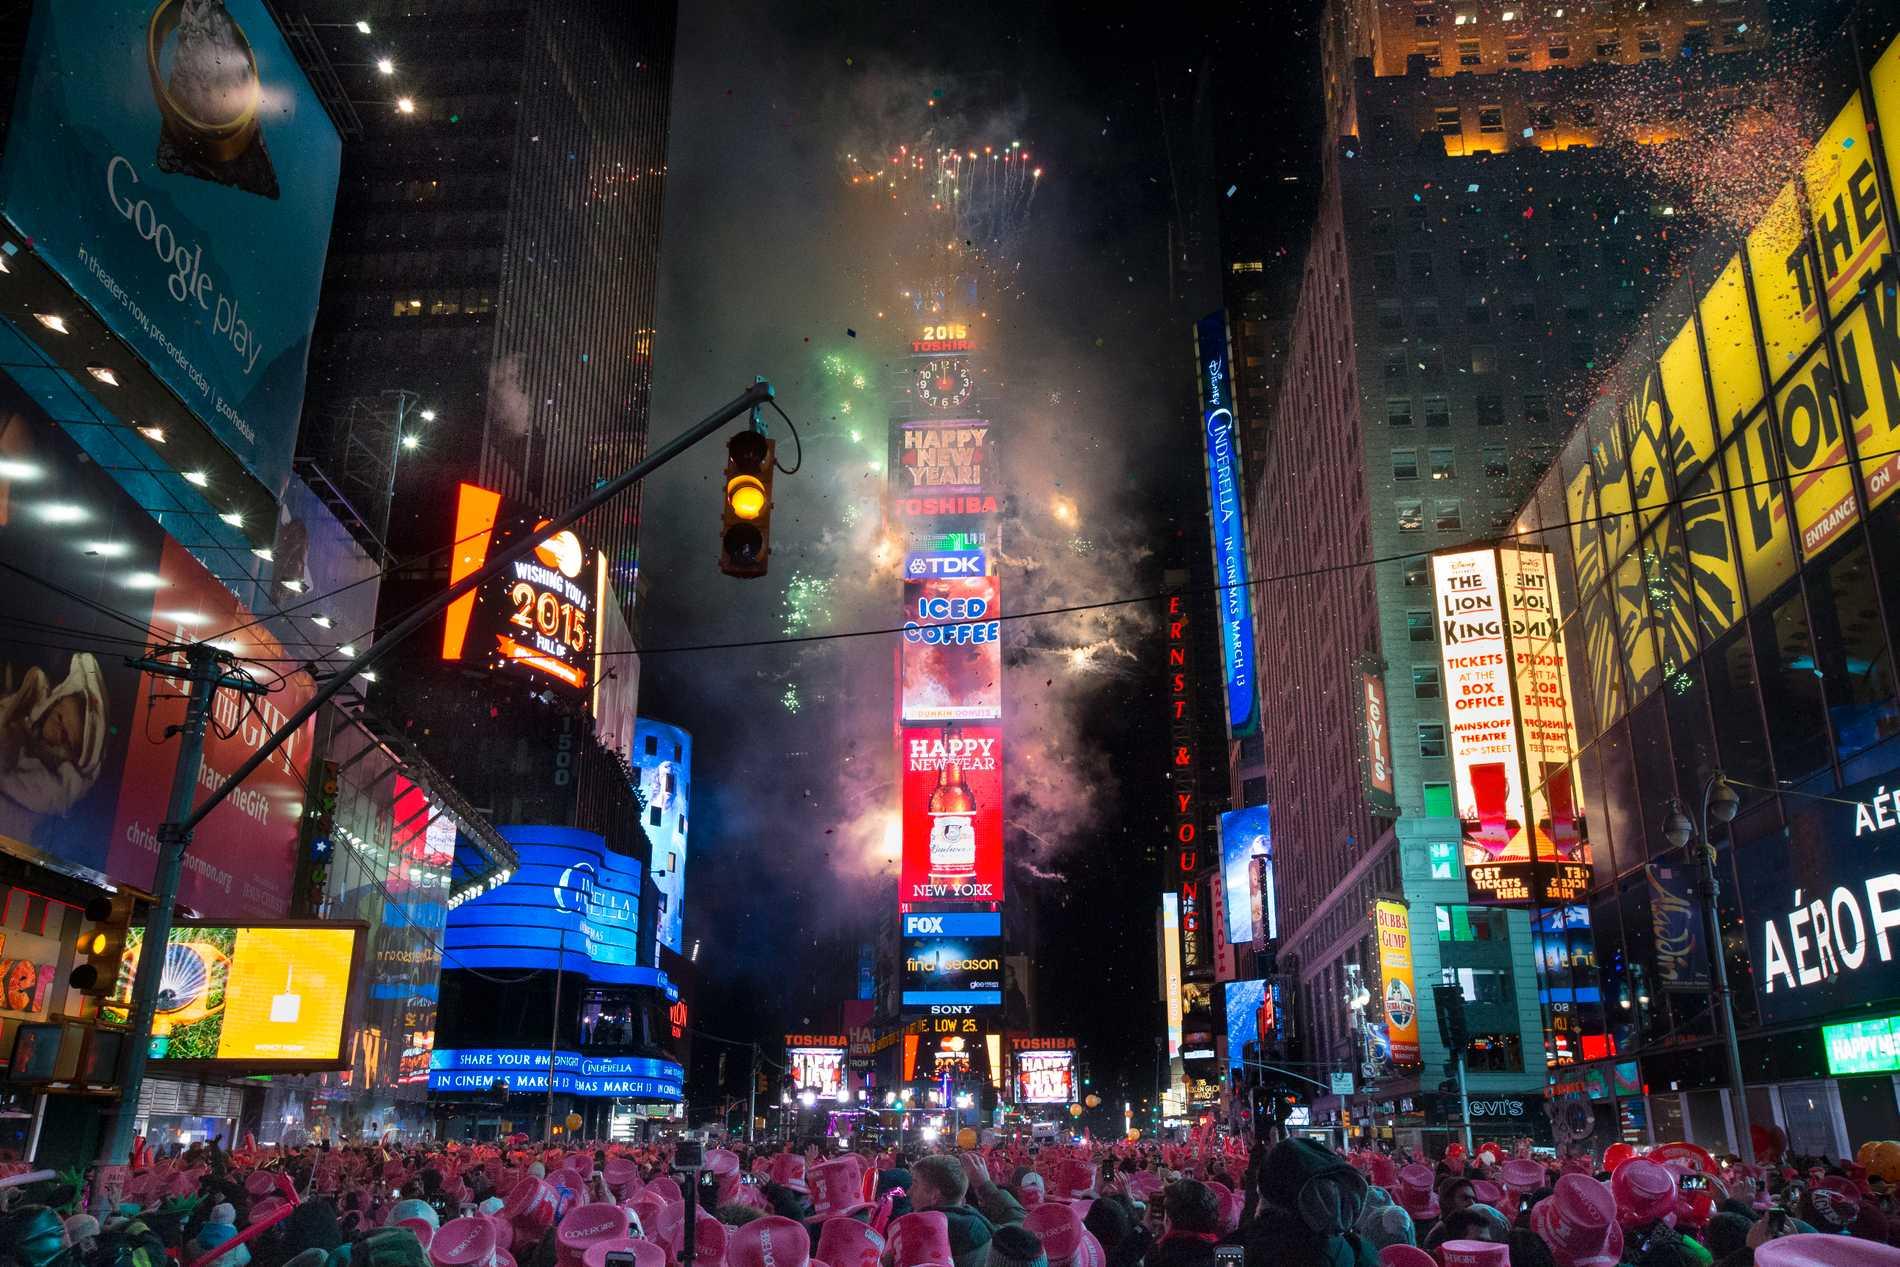 Många i New York vill fira nyårsafton vid Times Square.